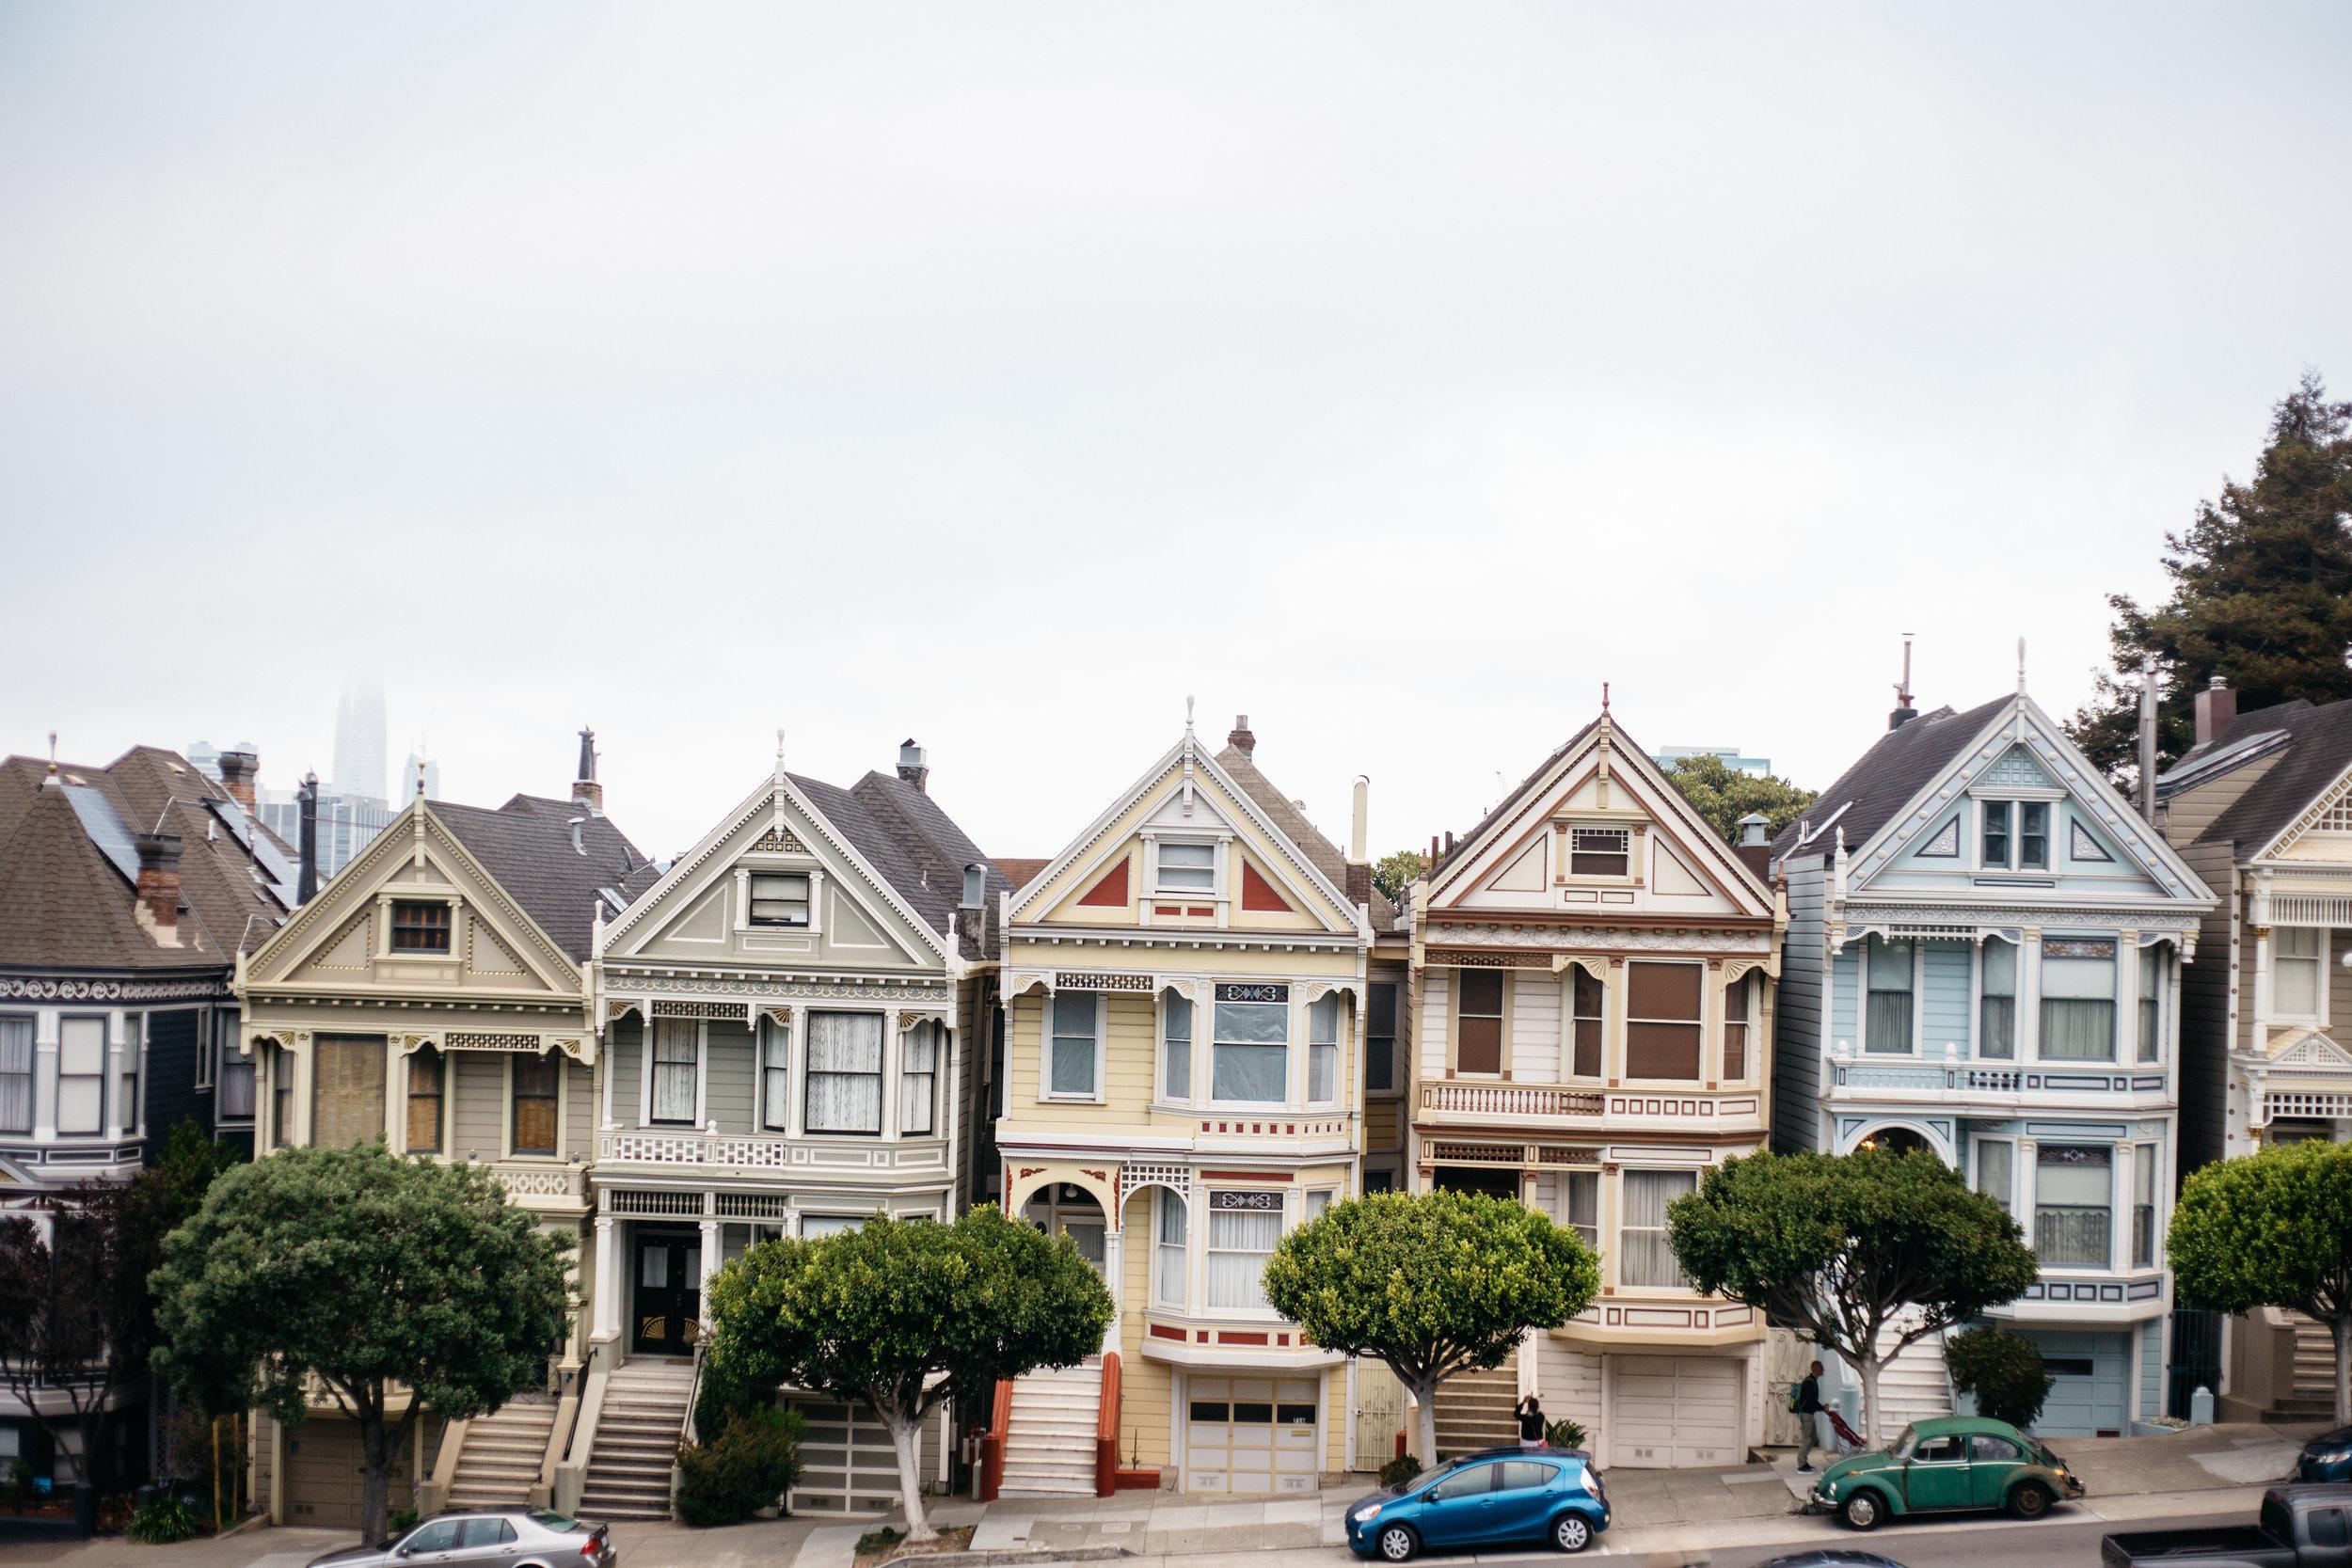 San Francisco, CA - Aug 2017